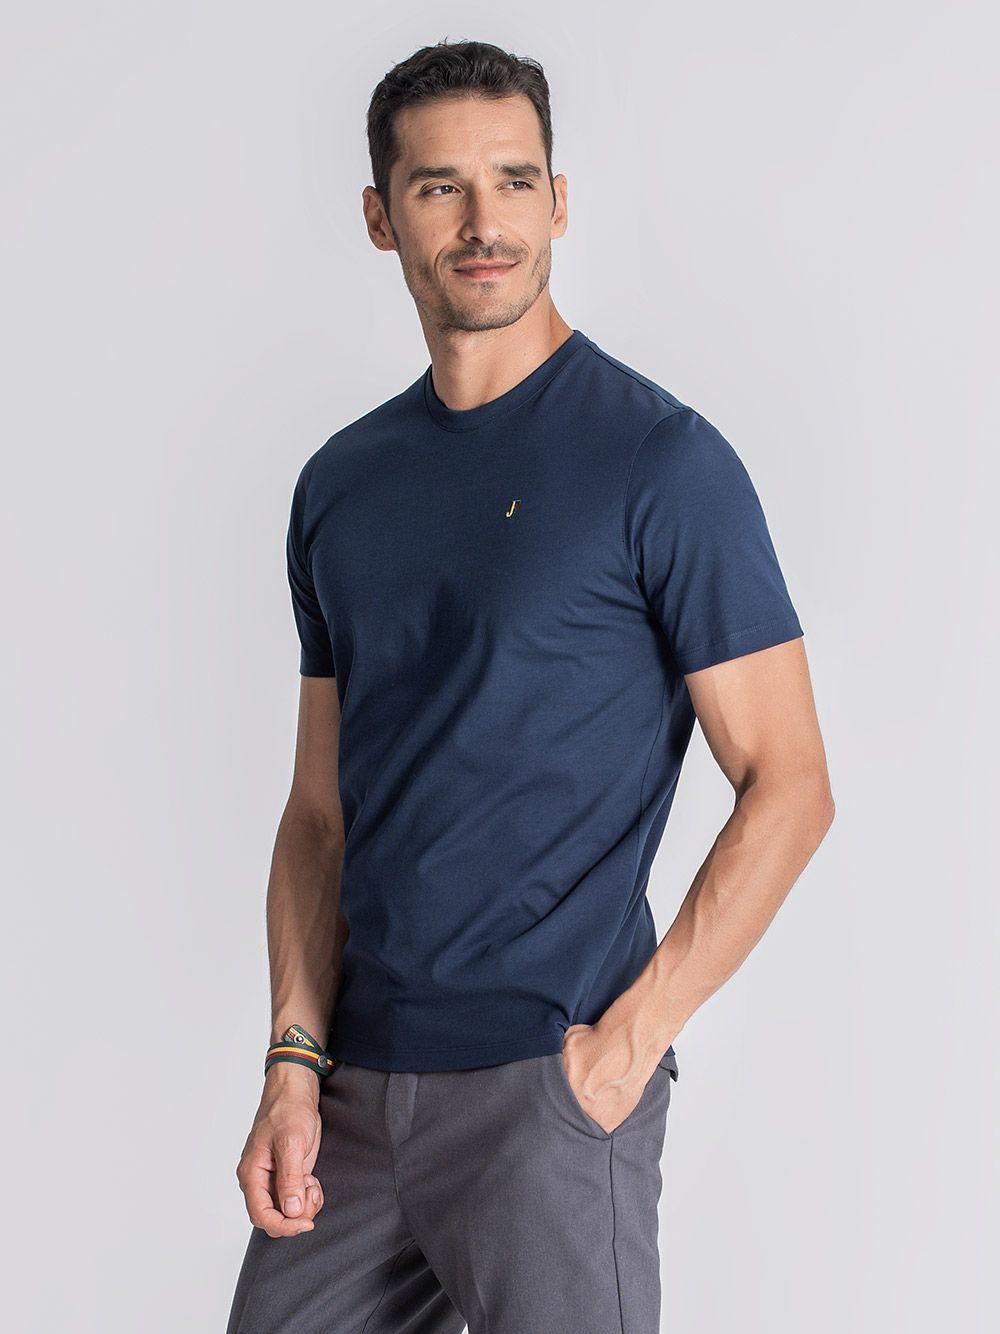 T-shirt Cataldi Azul Marinho | JEF